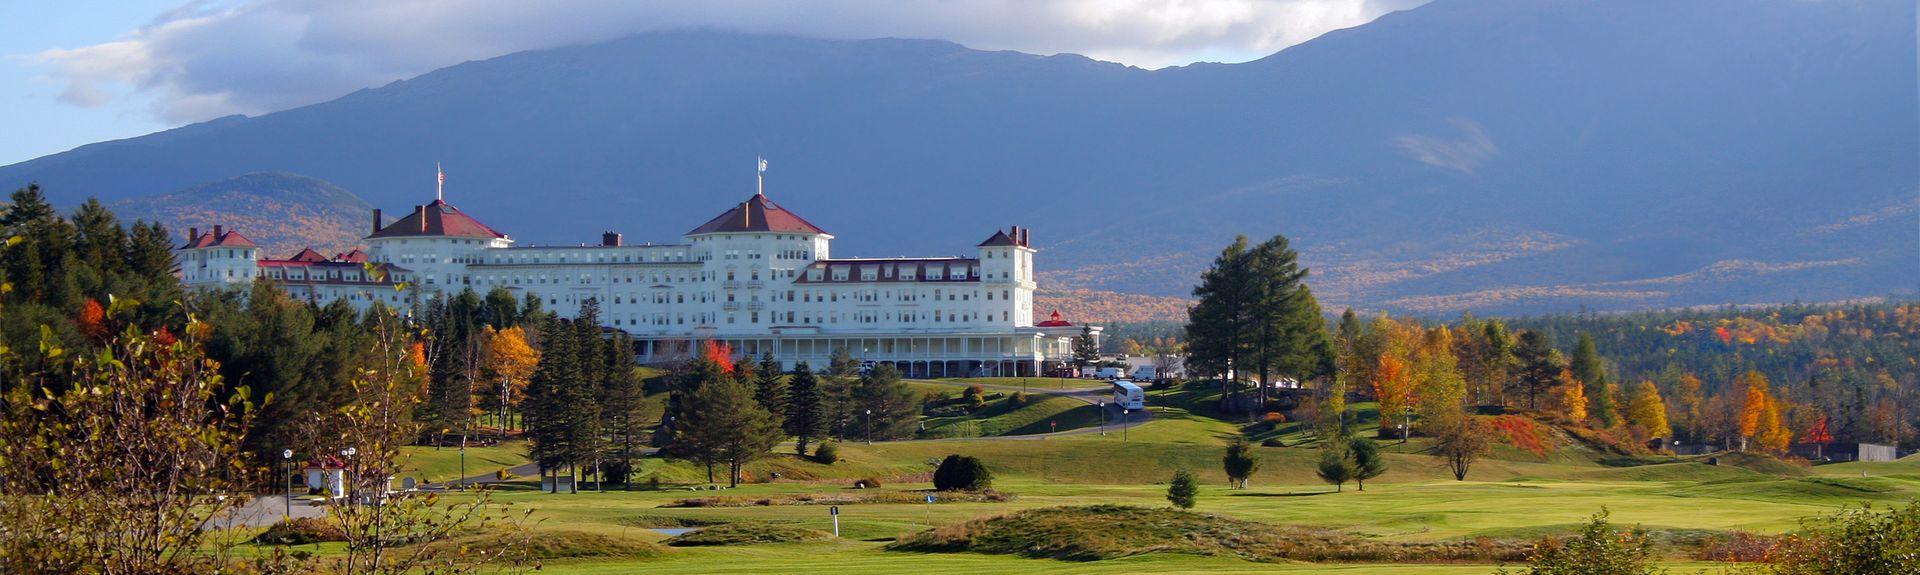 Bretton Woods, Carroll, NH, USA